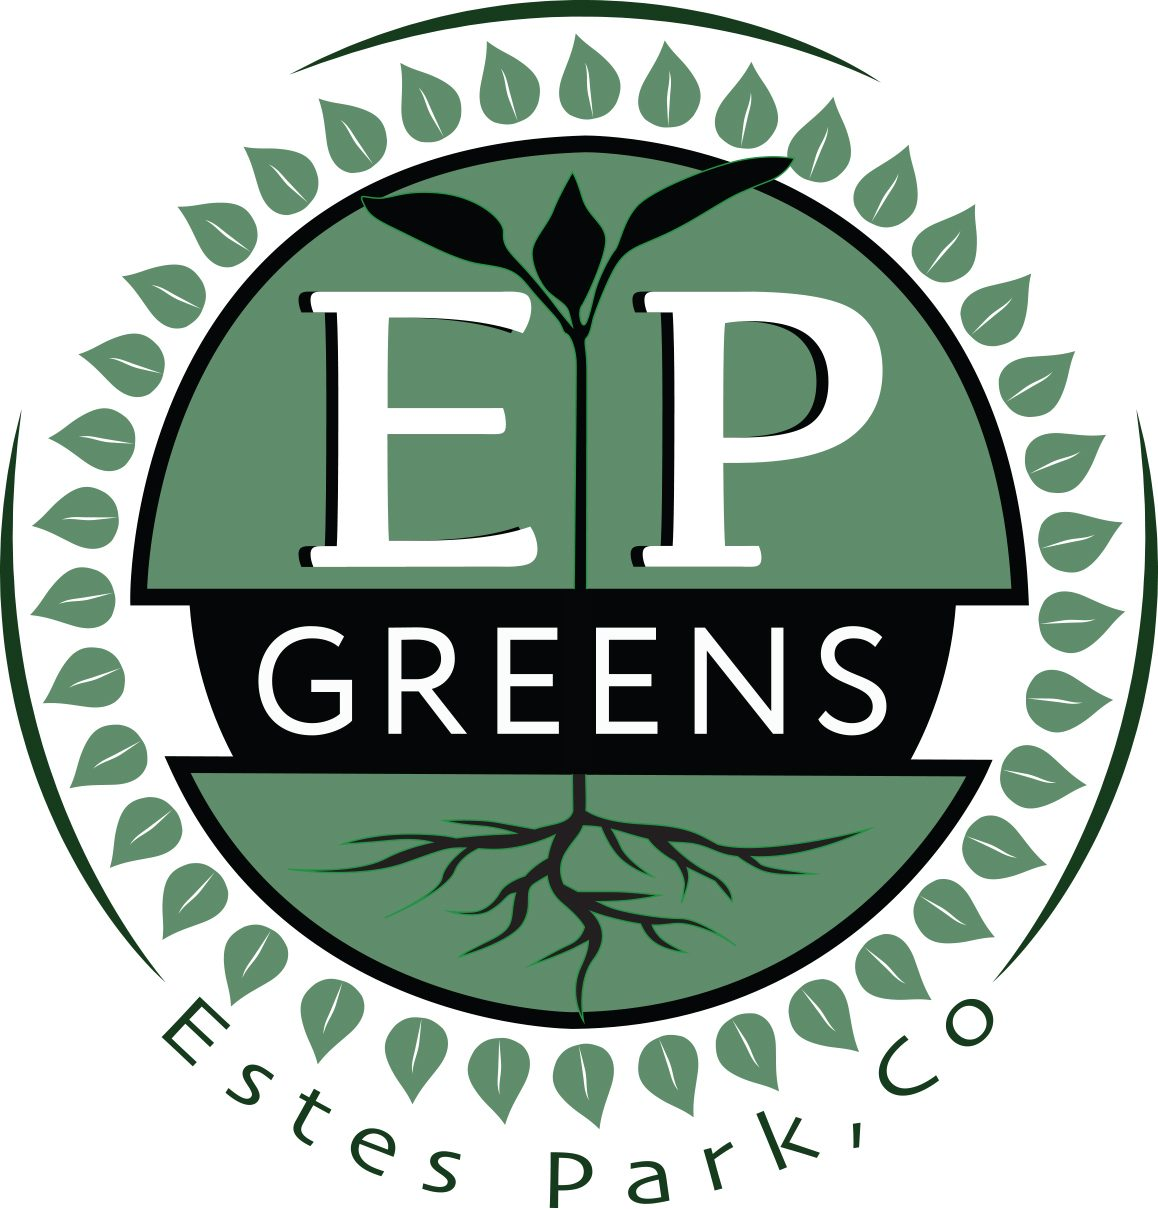 EP Greens